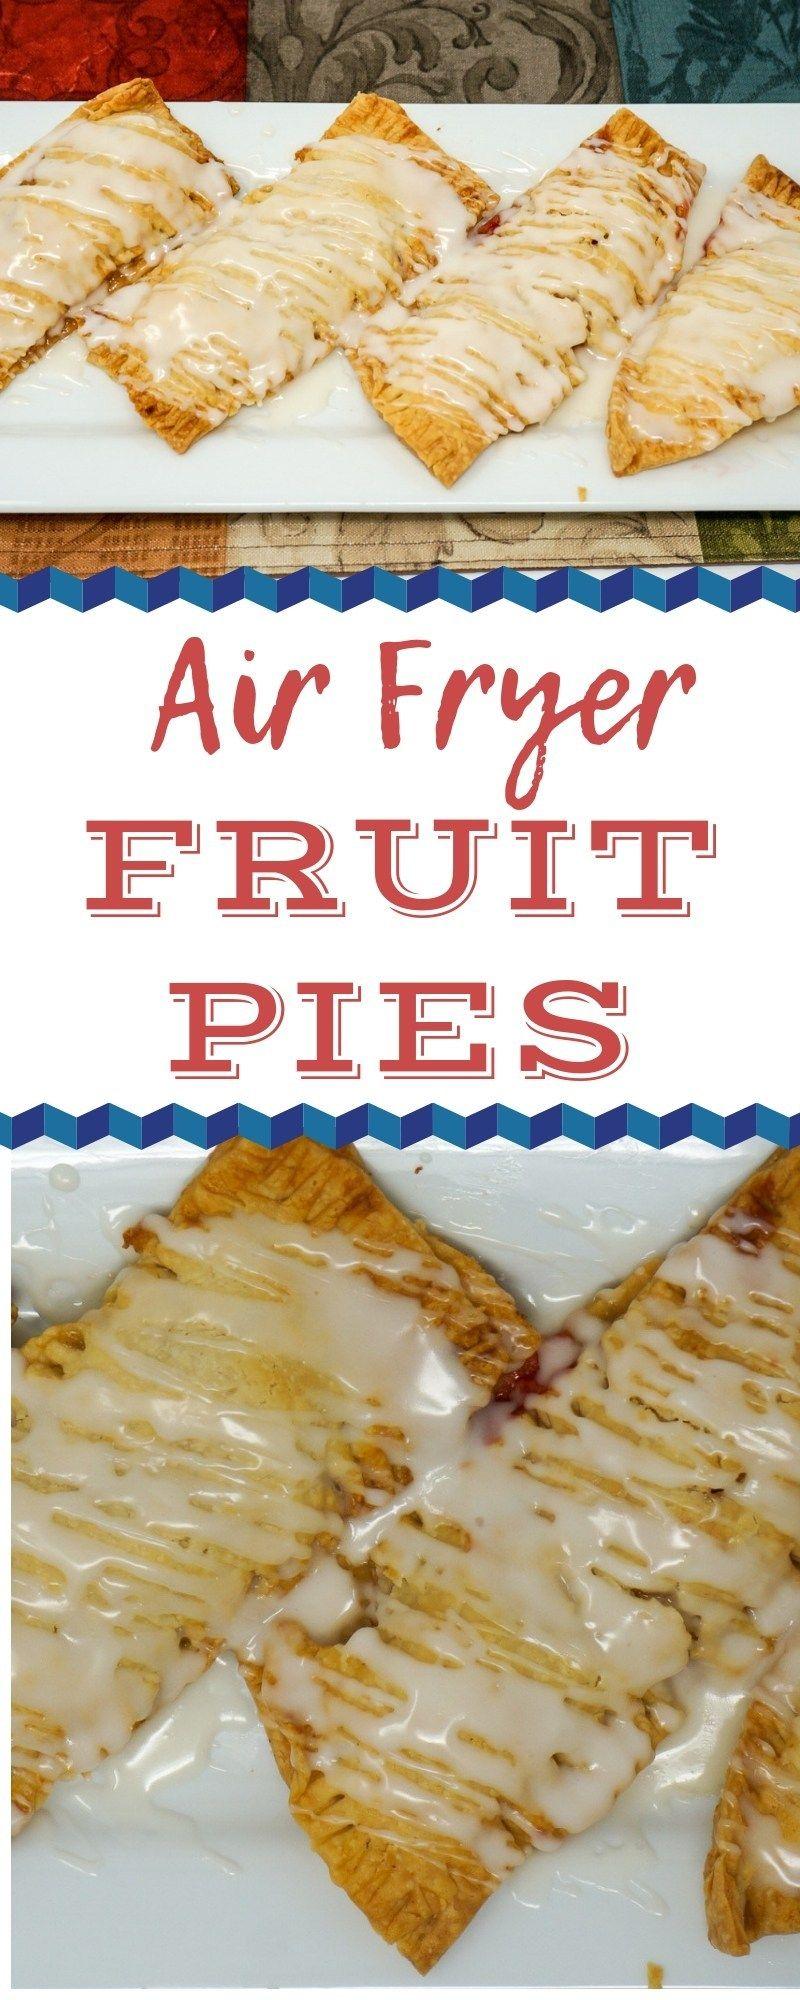 Air Fryer Fruit Pies Recipe Air fryer recipes, Air